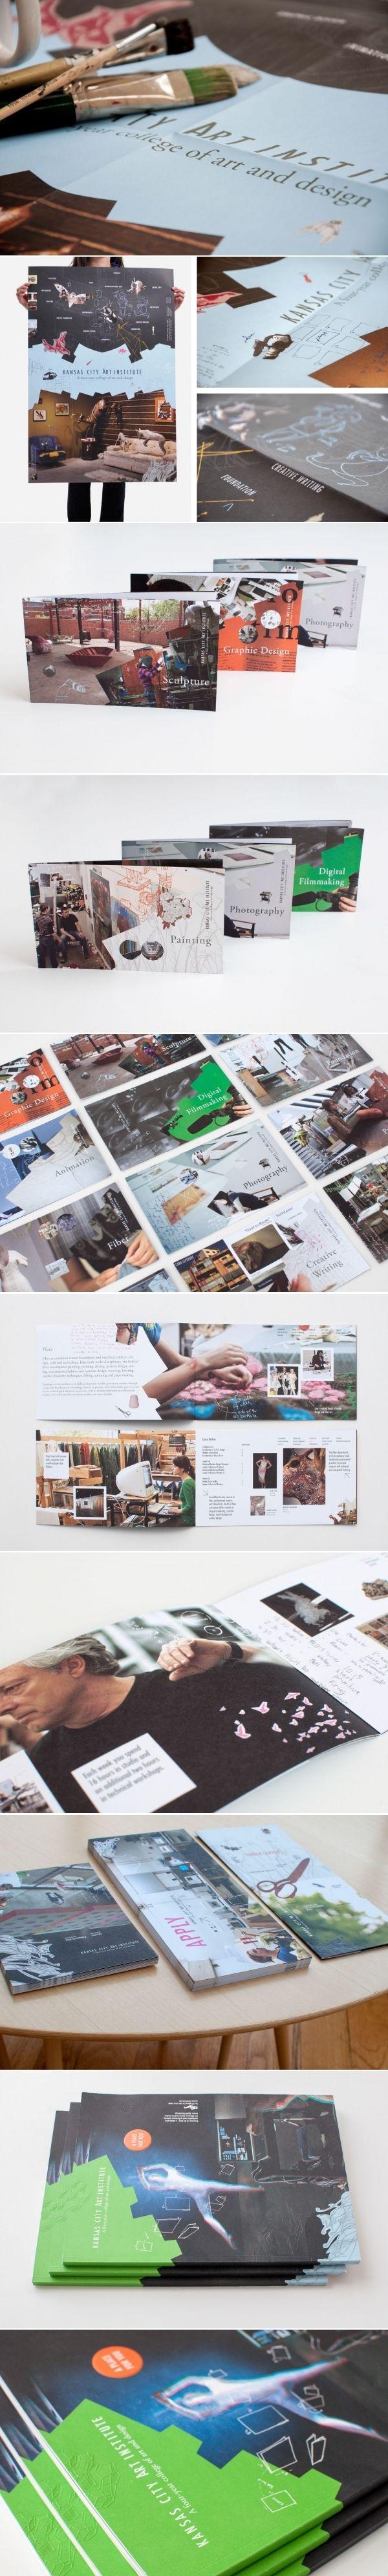 Kansas City Art Institute   Art Direction, Design, Marketing Materials   Design Ranch